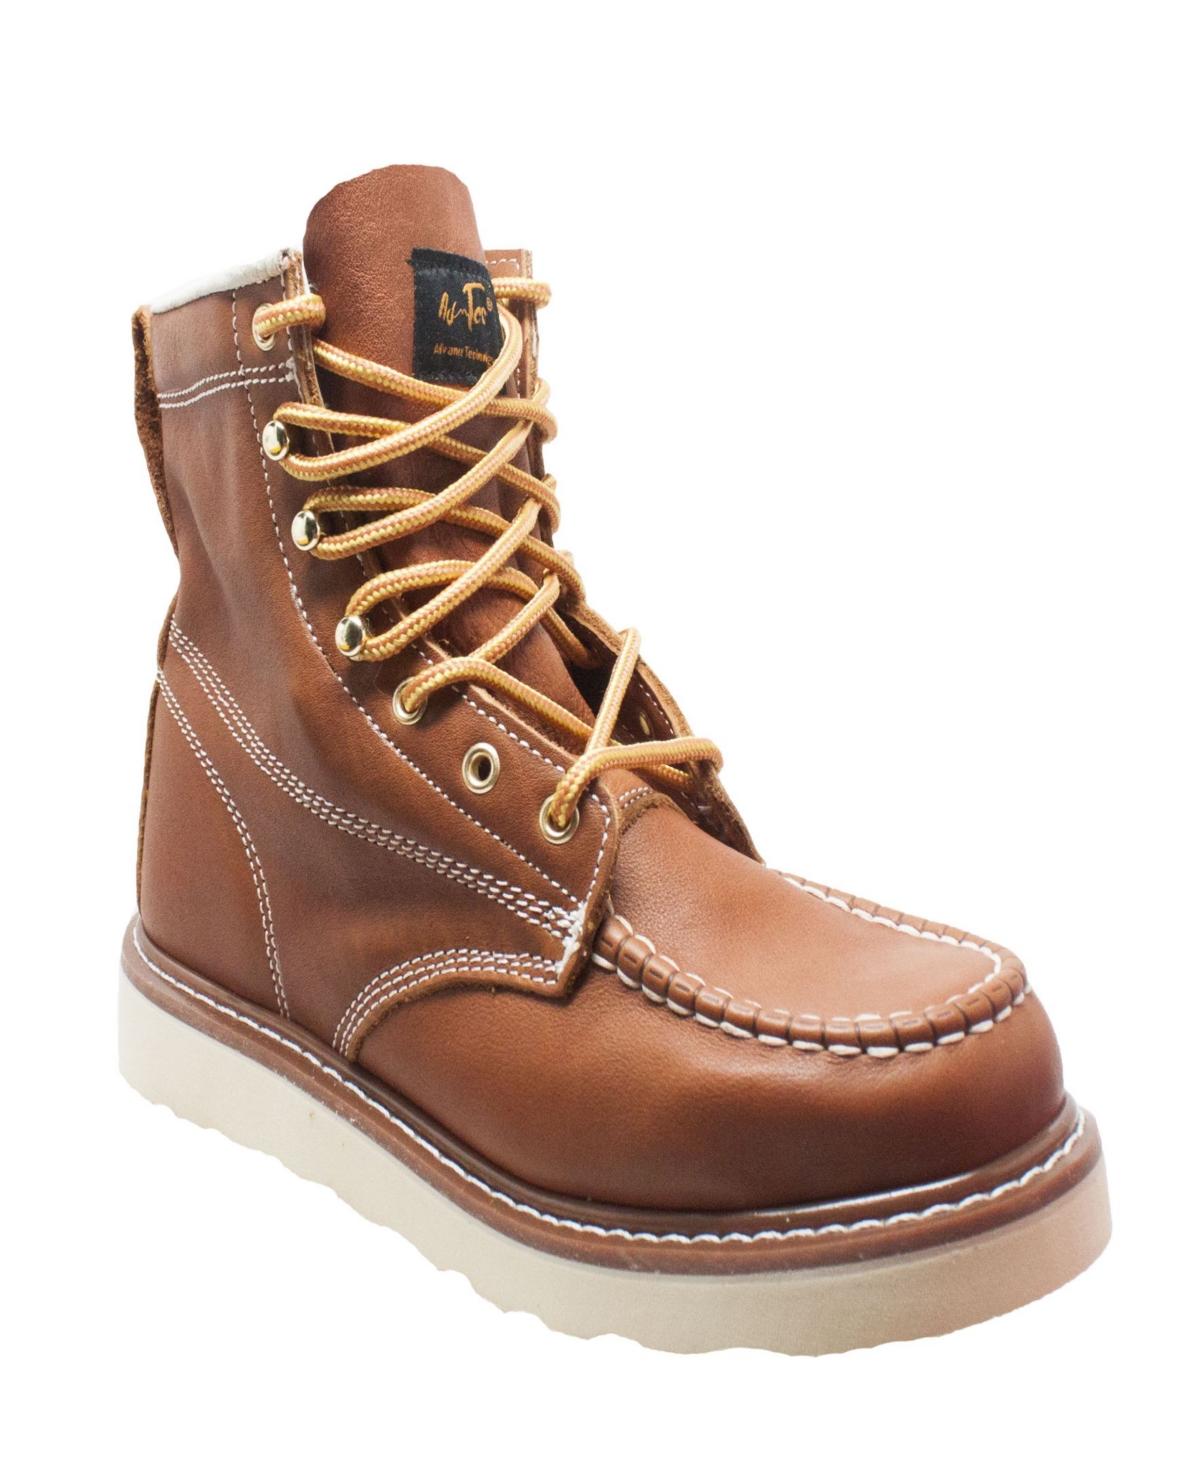 "AdTec Men's 6"" Moc Toe Work Boot Men's Shoes"